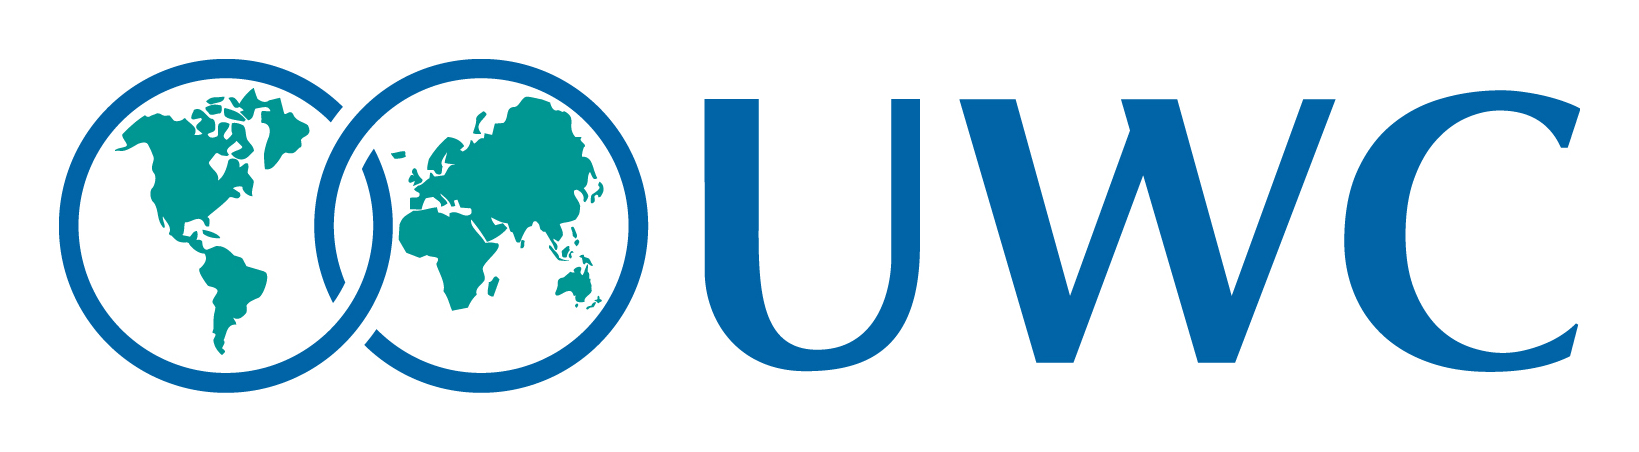 UWC_International_RGB_screen.jpg